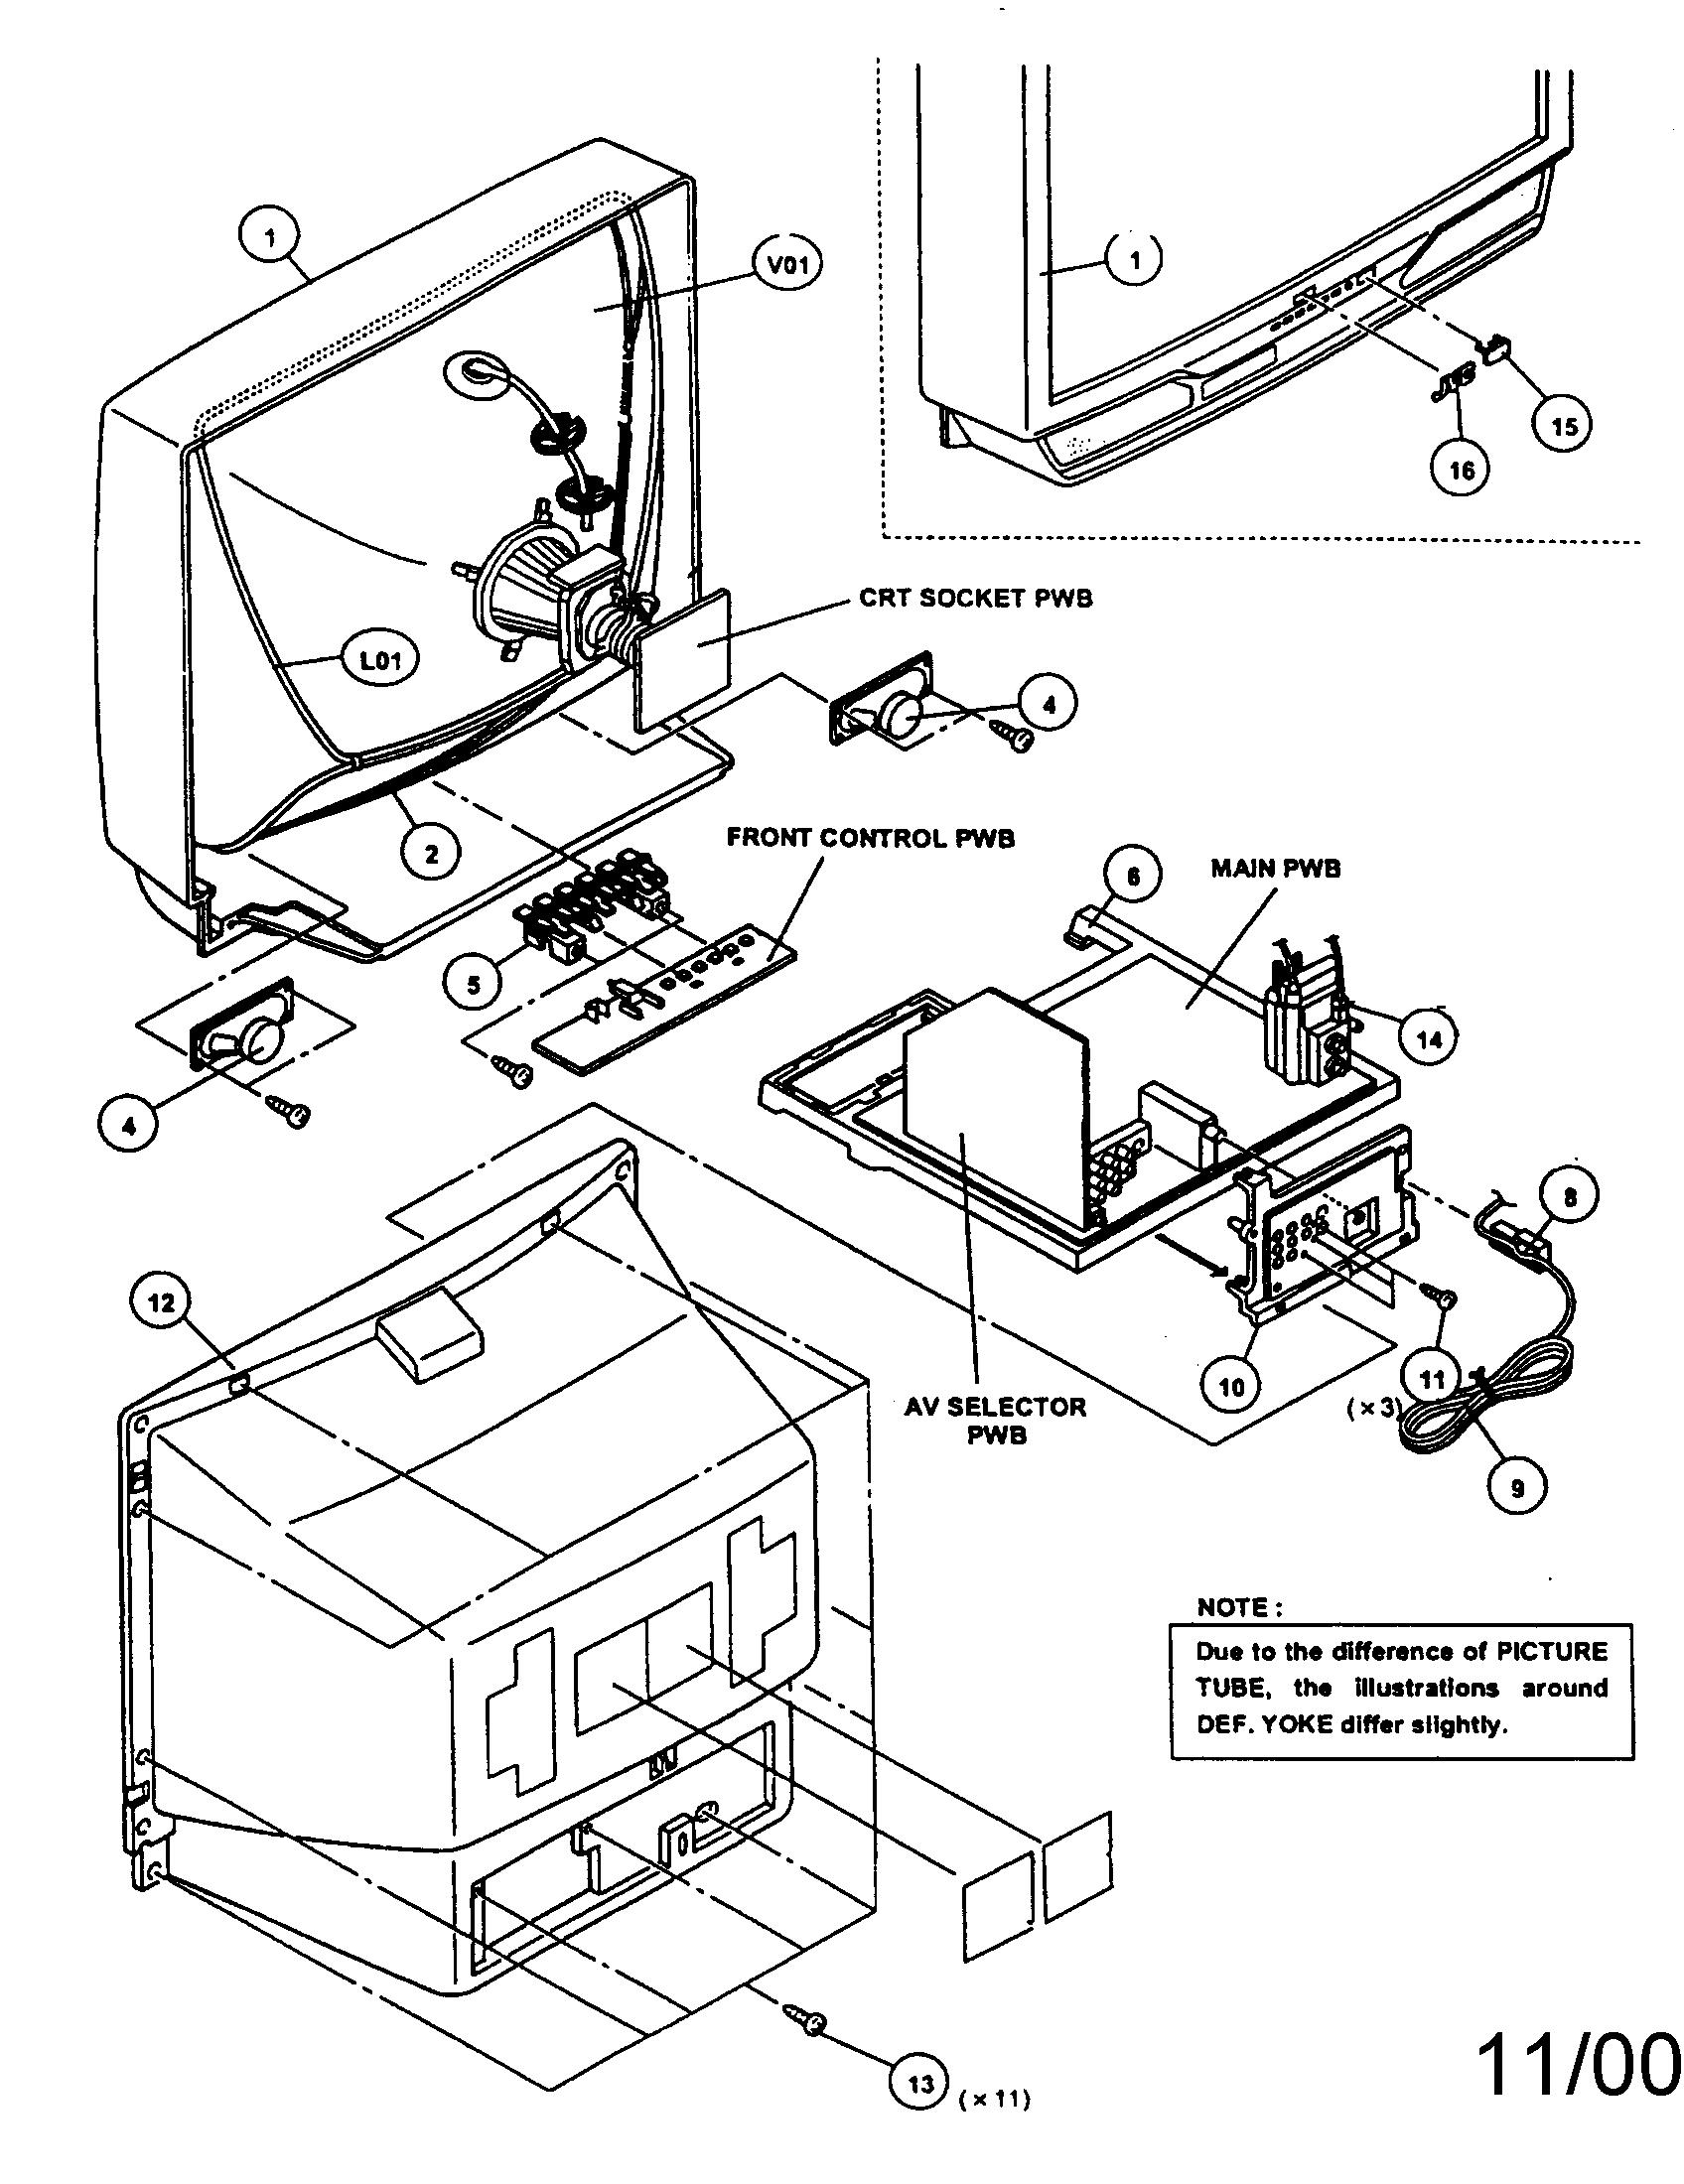 circuit diagram jvc tv jvc camxg9bk service manual immediate download JVC Car Stereo medium resolution of jvc tv diagram wiring diagrams scematic jvc tv vcr jvc tv diagram